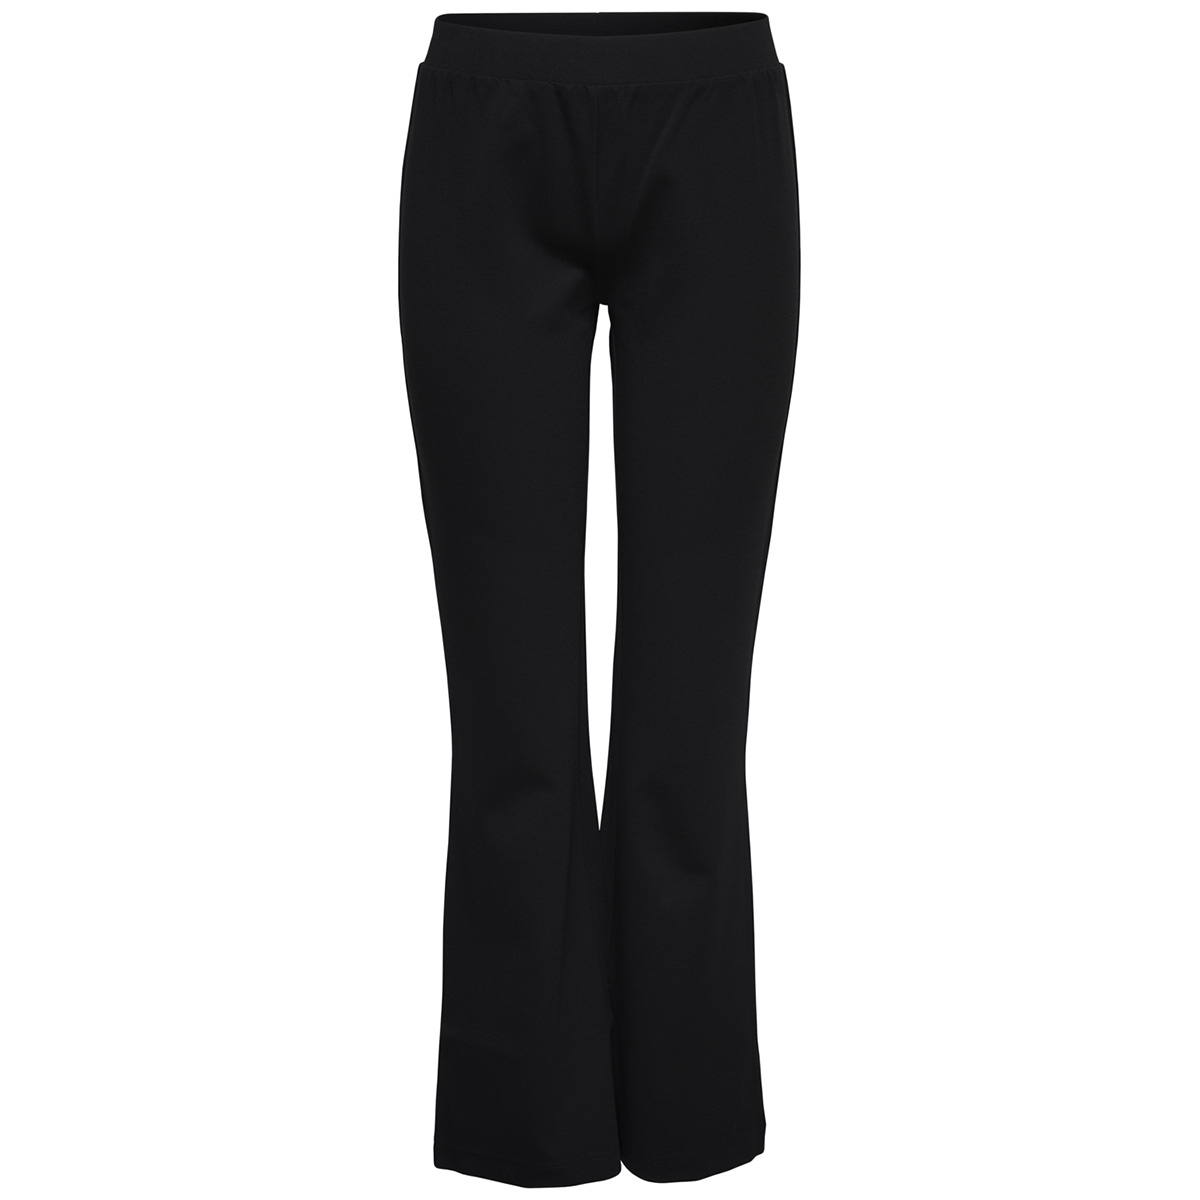 jdyea flare leggings jrs 15168312 jacqueline de yong legging black